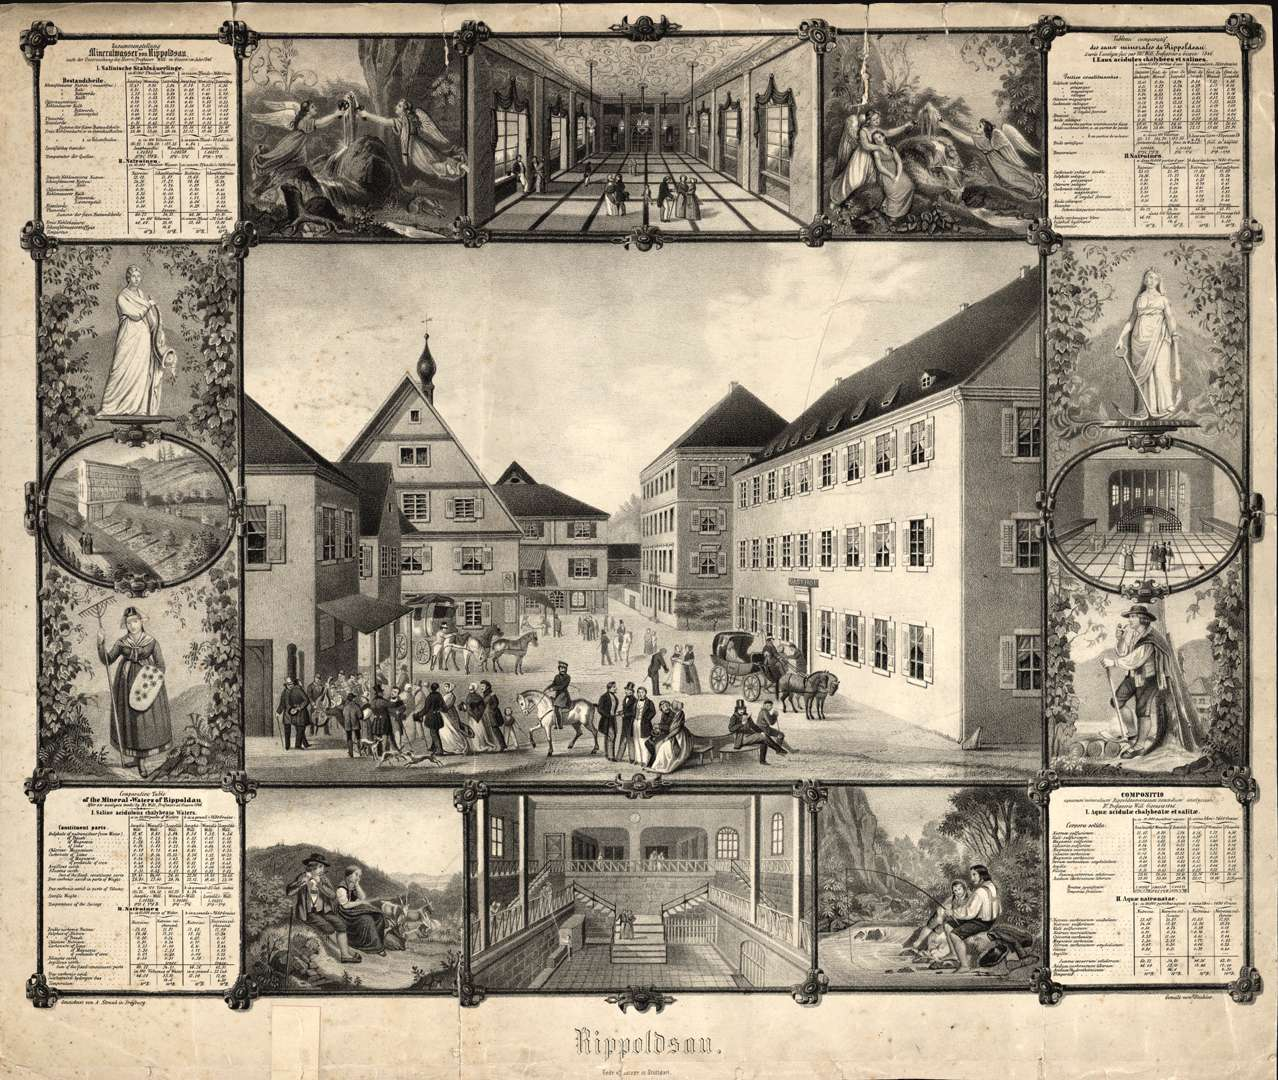 Rippoldsau [Werbeblatt], Bild 1